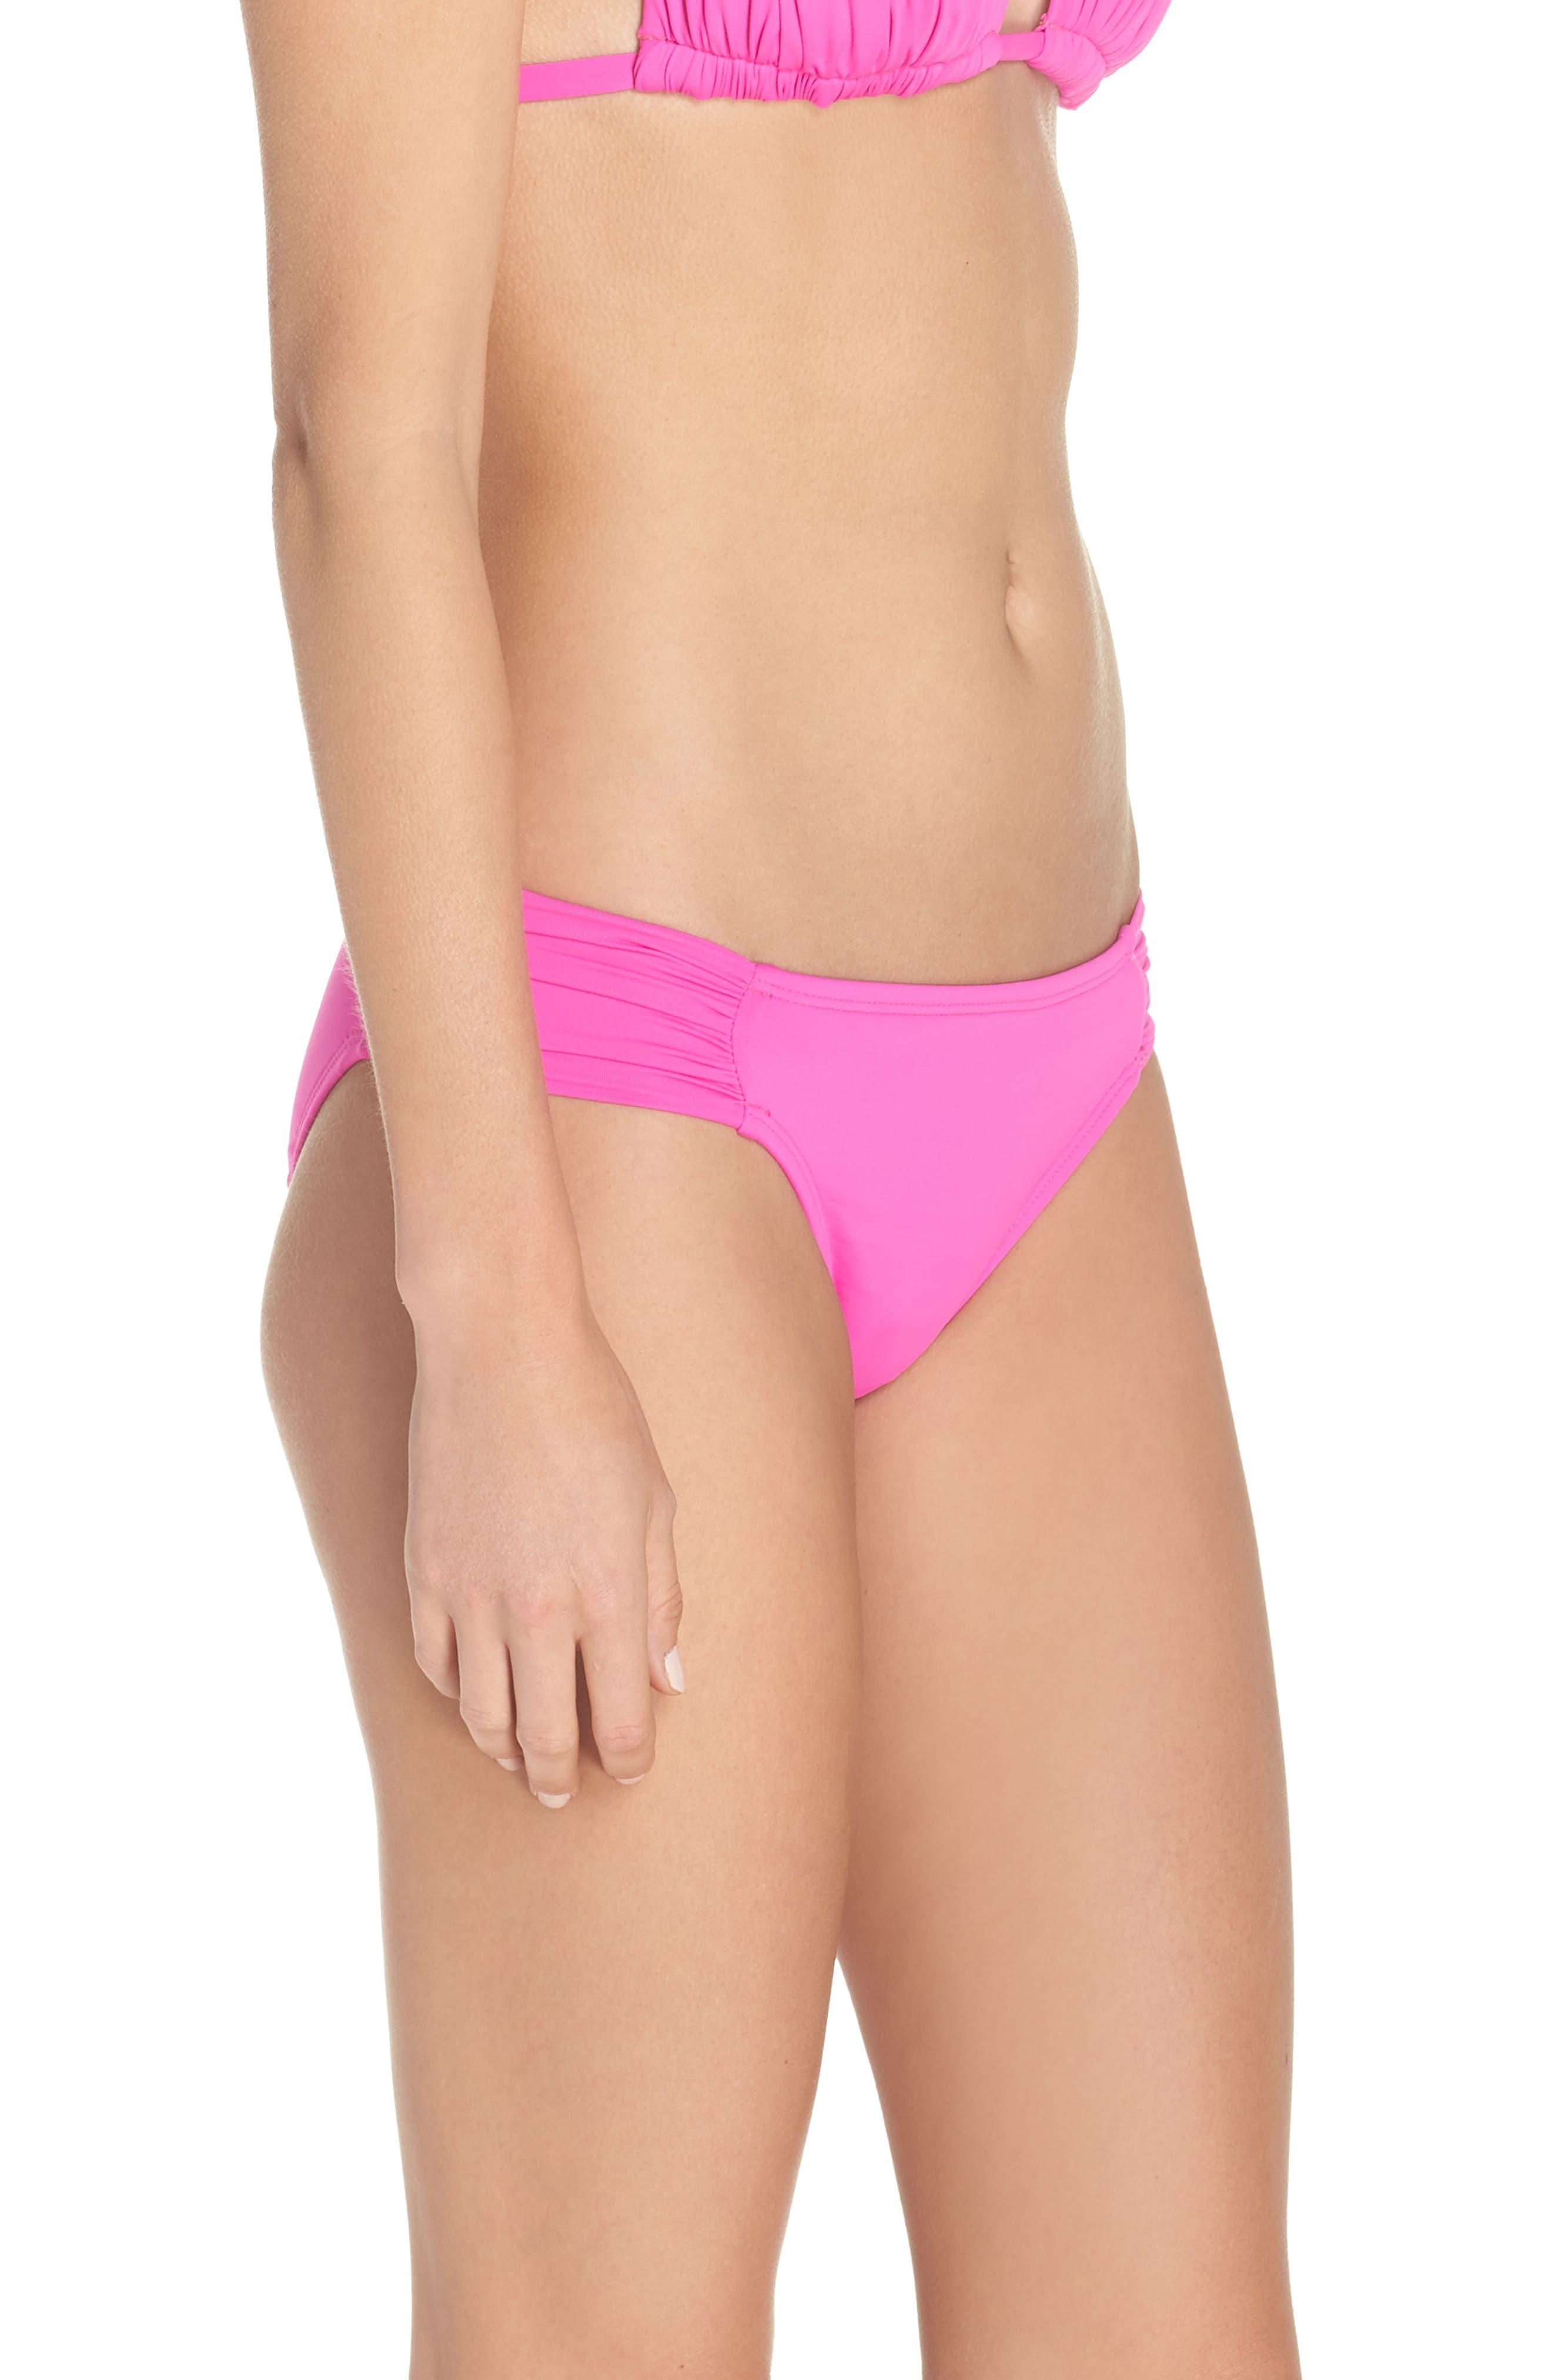 Island Blanca Halter Bikini Top,                             Alternate thumbnail 3, color,                             ELECTRIC PINK